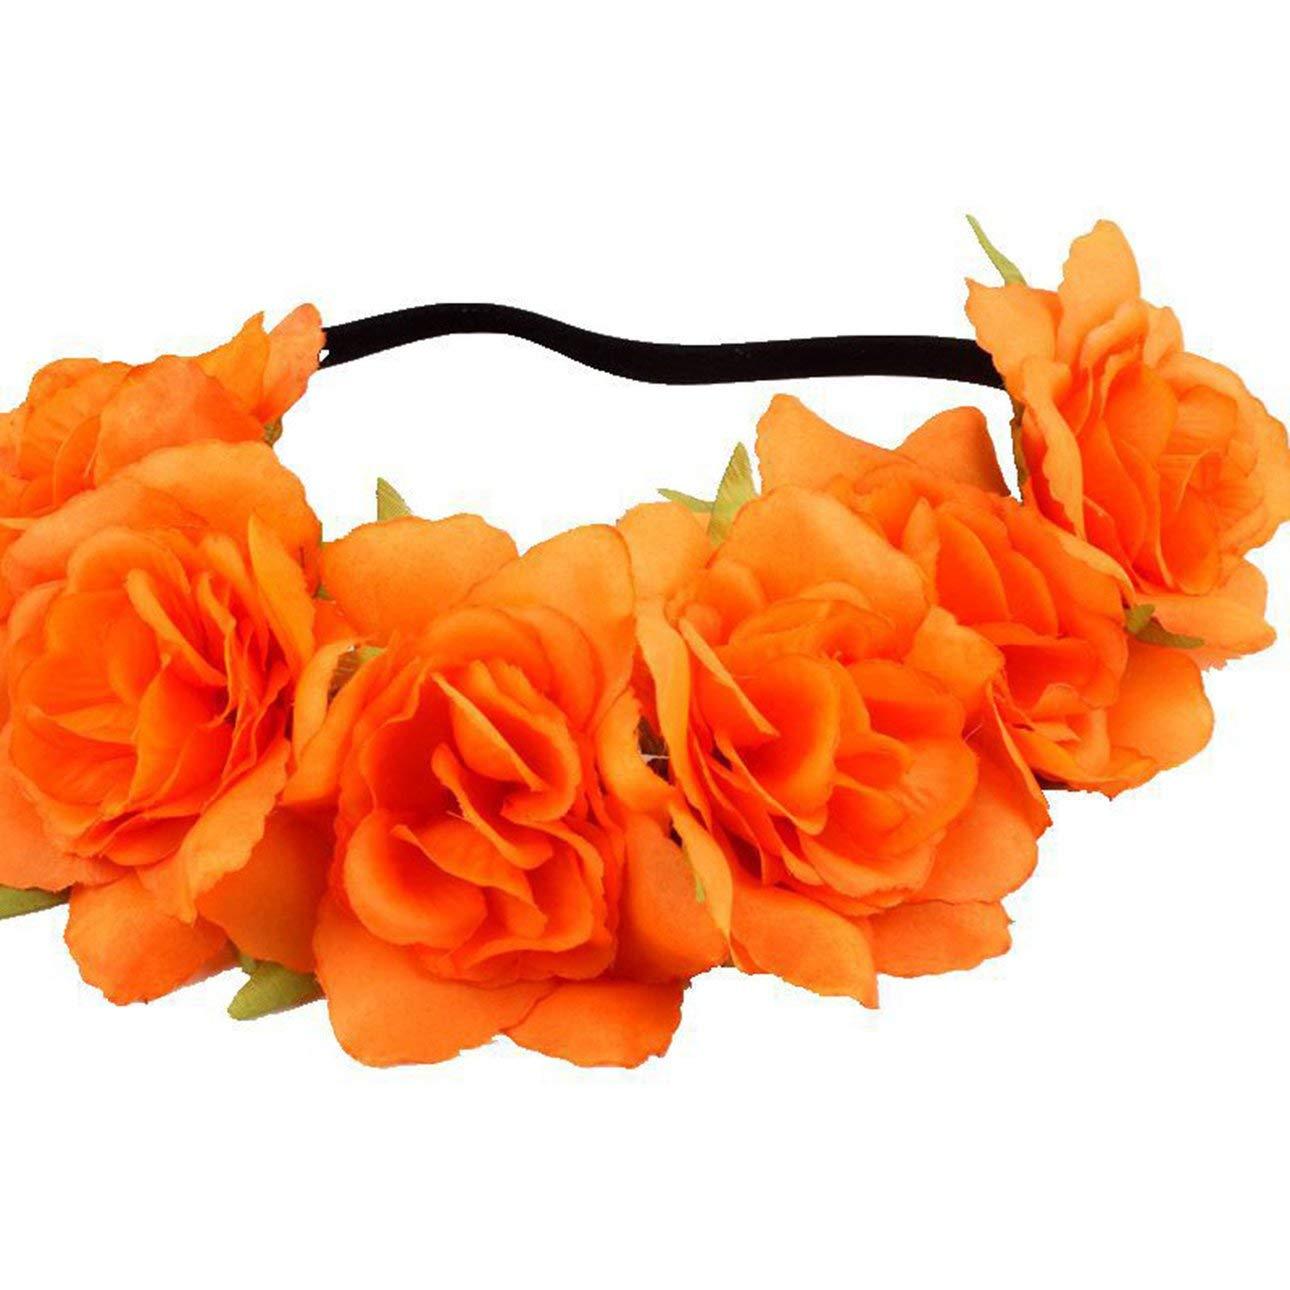 Liobaba Fashion Women Girl Flower Headband Hollow Elastic Hair Band for Wedding Party